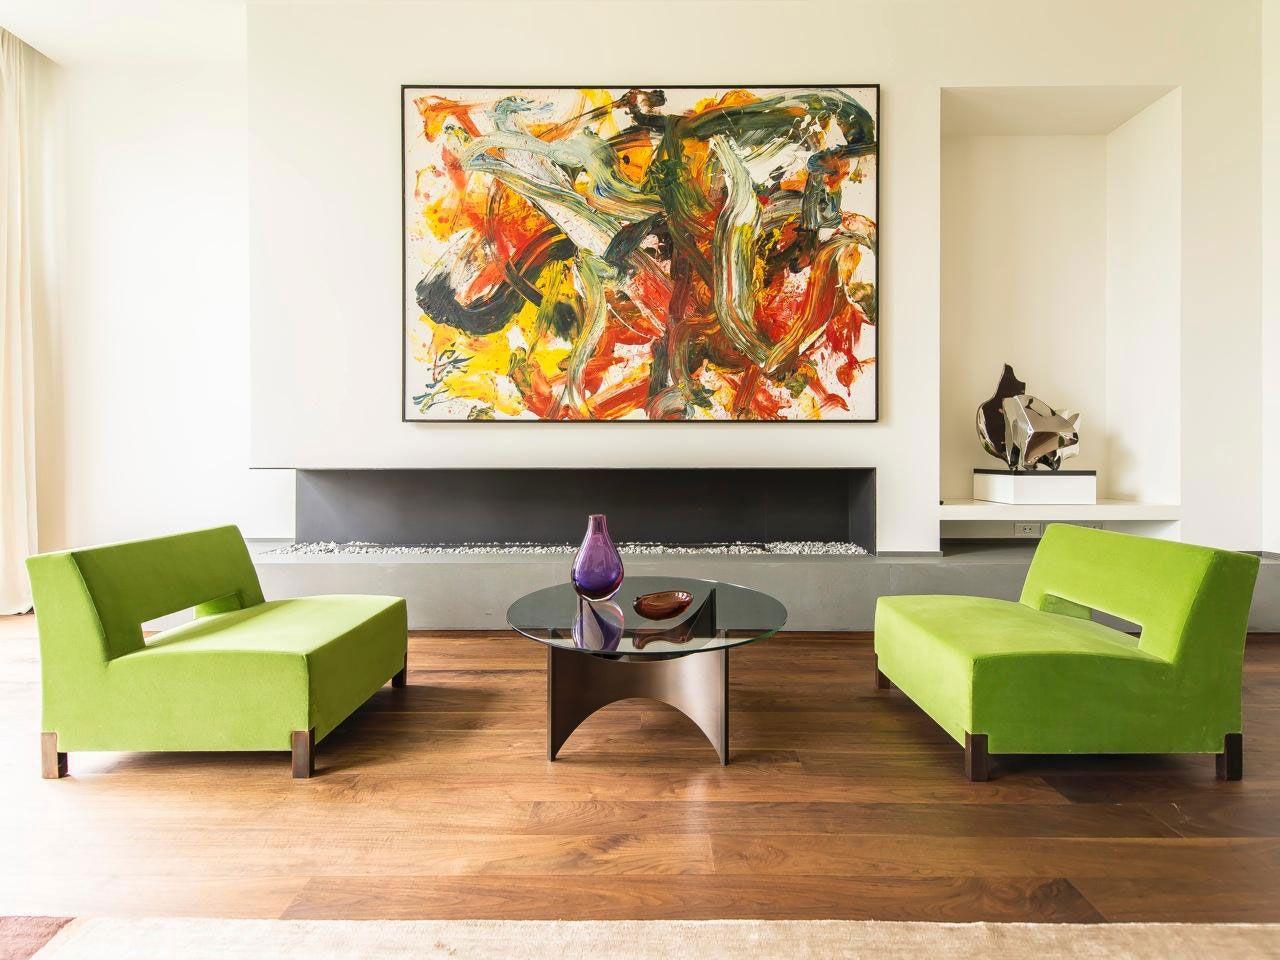 Chic Elegant Apartment in Brussels With Bright Interiors-10